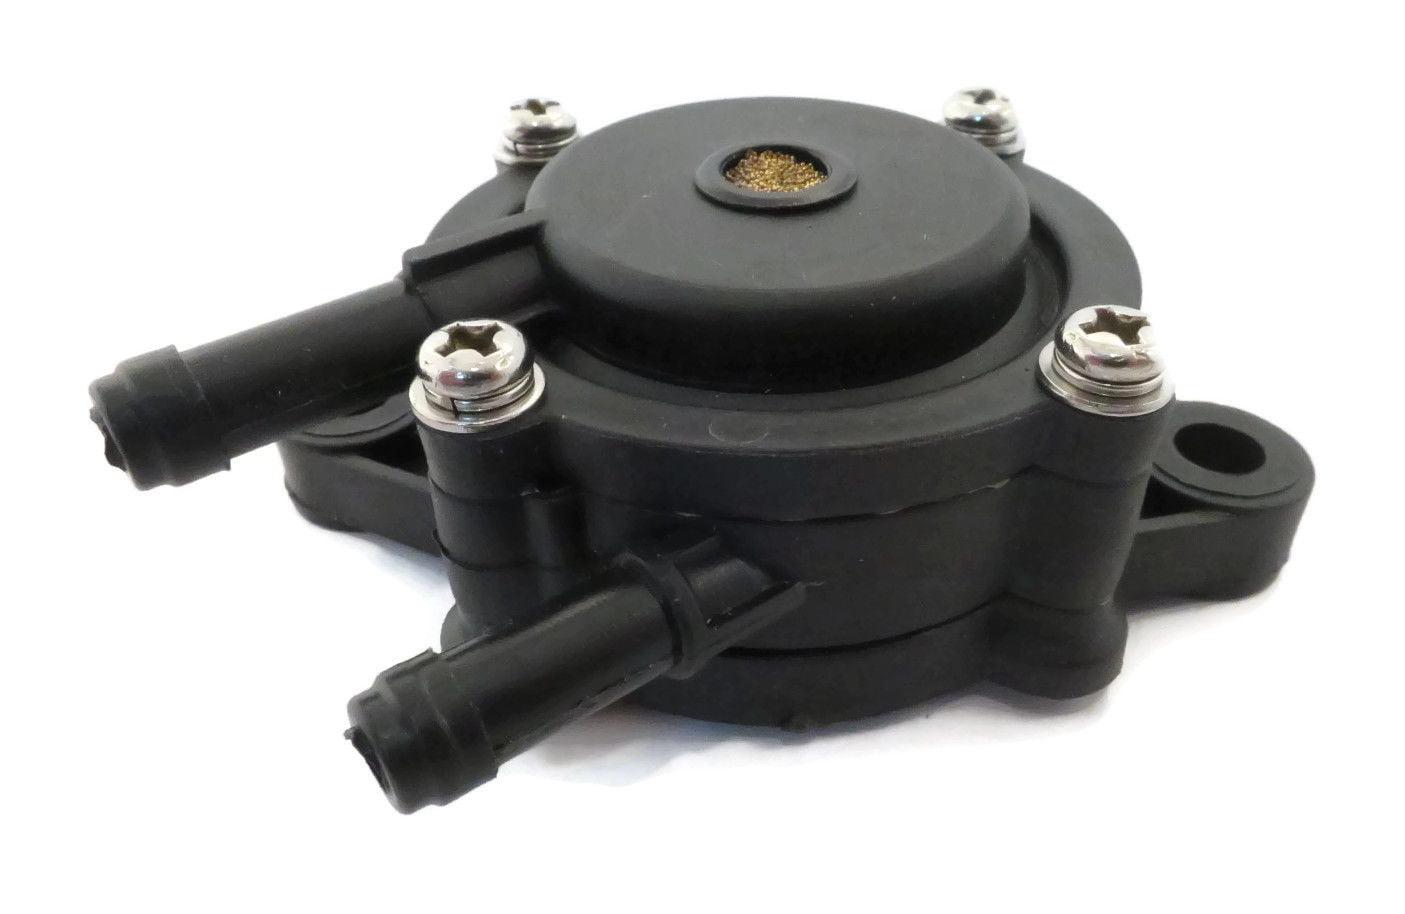 Fuel Pump for John Deere LA175 LT166 LT170 LT180 LT190 LTR155 LTR166 LTR180